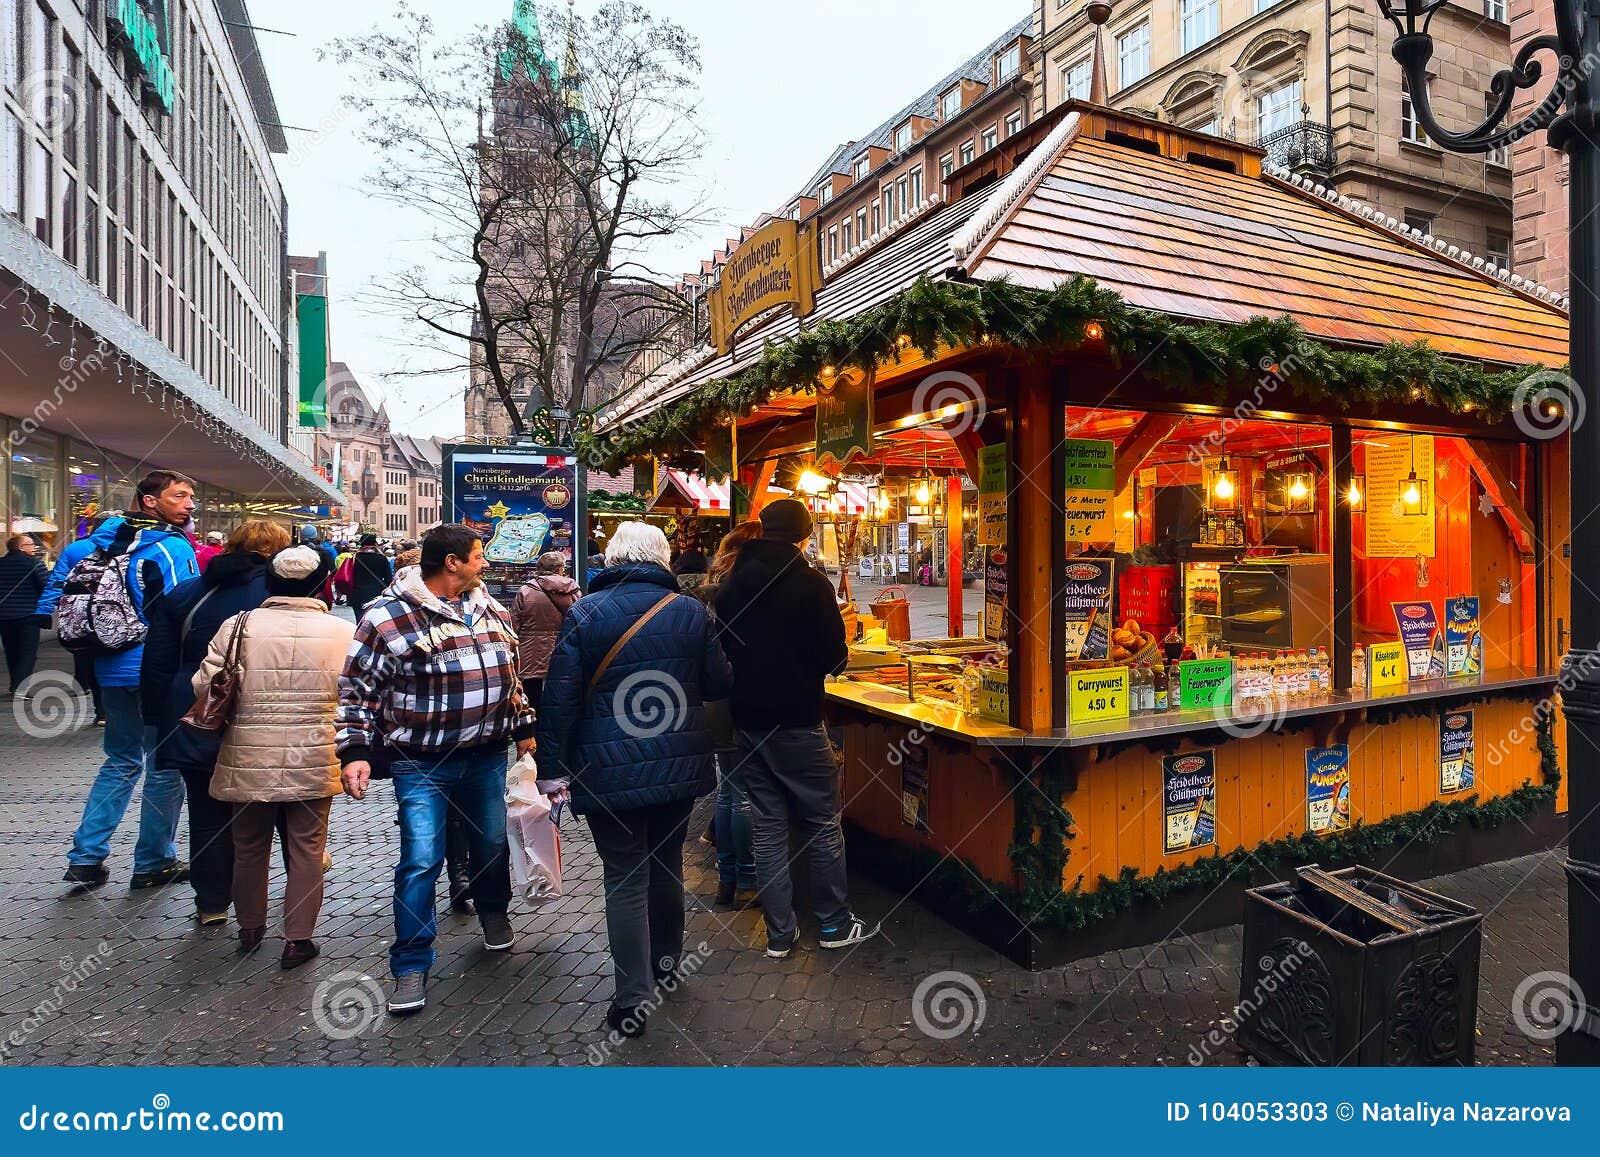 Christmas Market In Nuremberg, Bavaria Editorial Stock Photo - Image ...